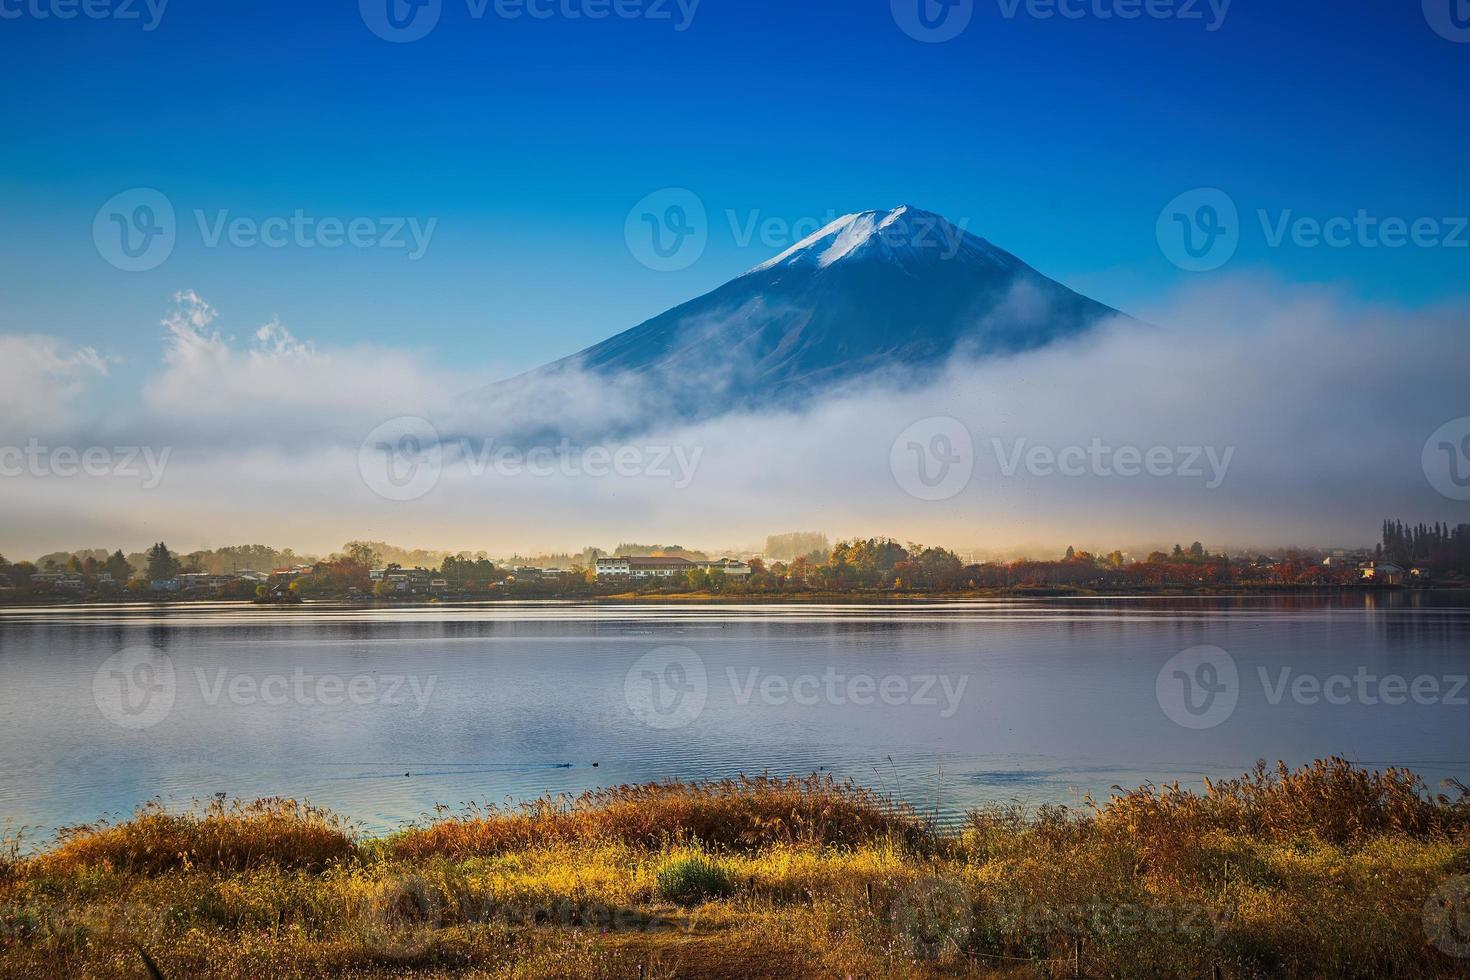 Mountain Fuji and Kawaguchiko lake photo